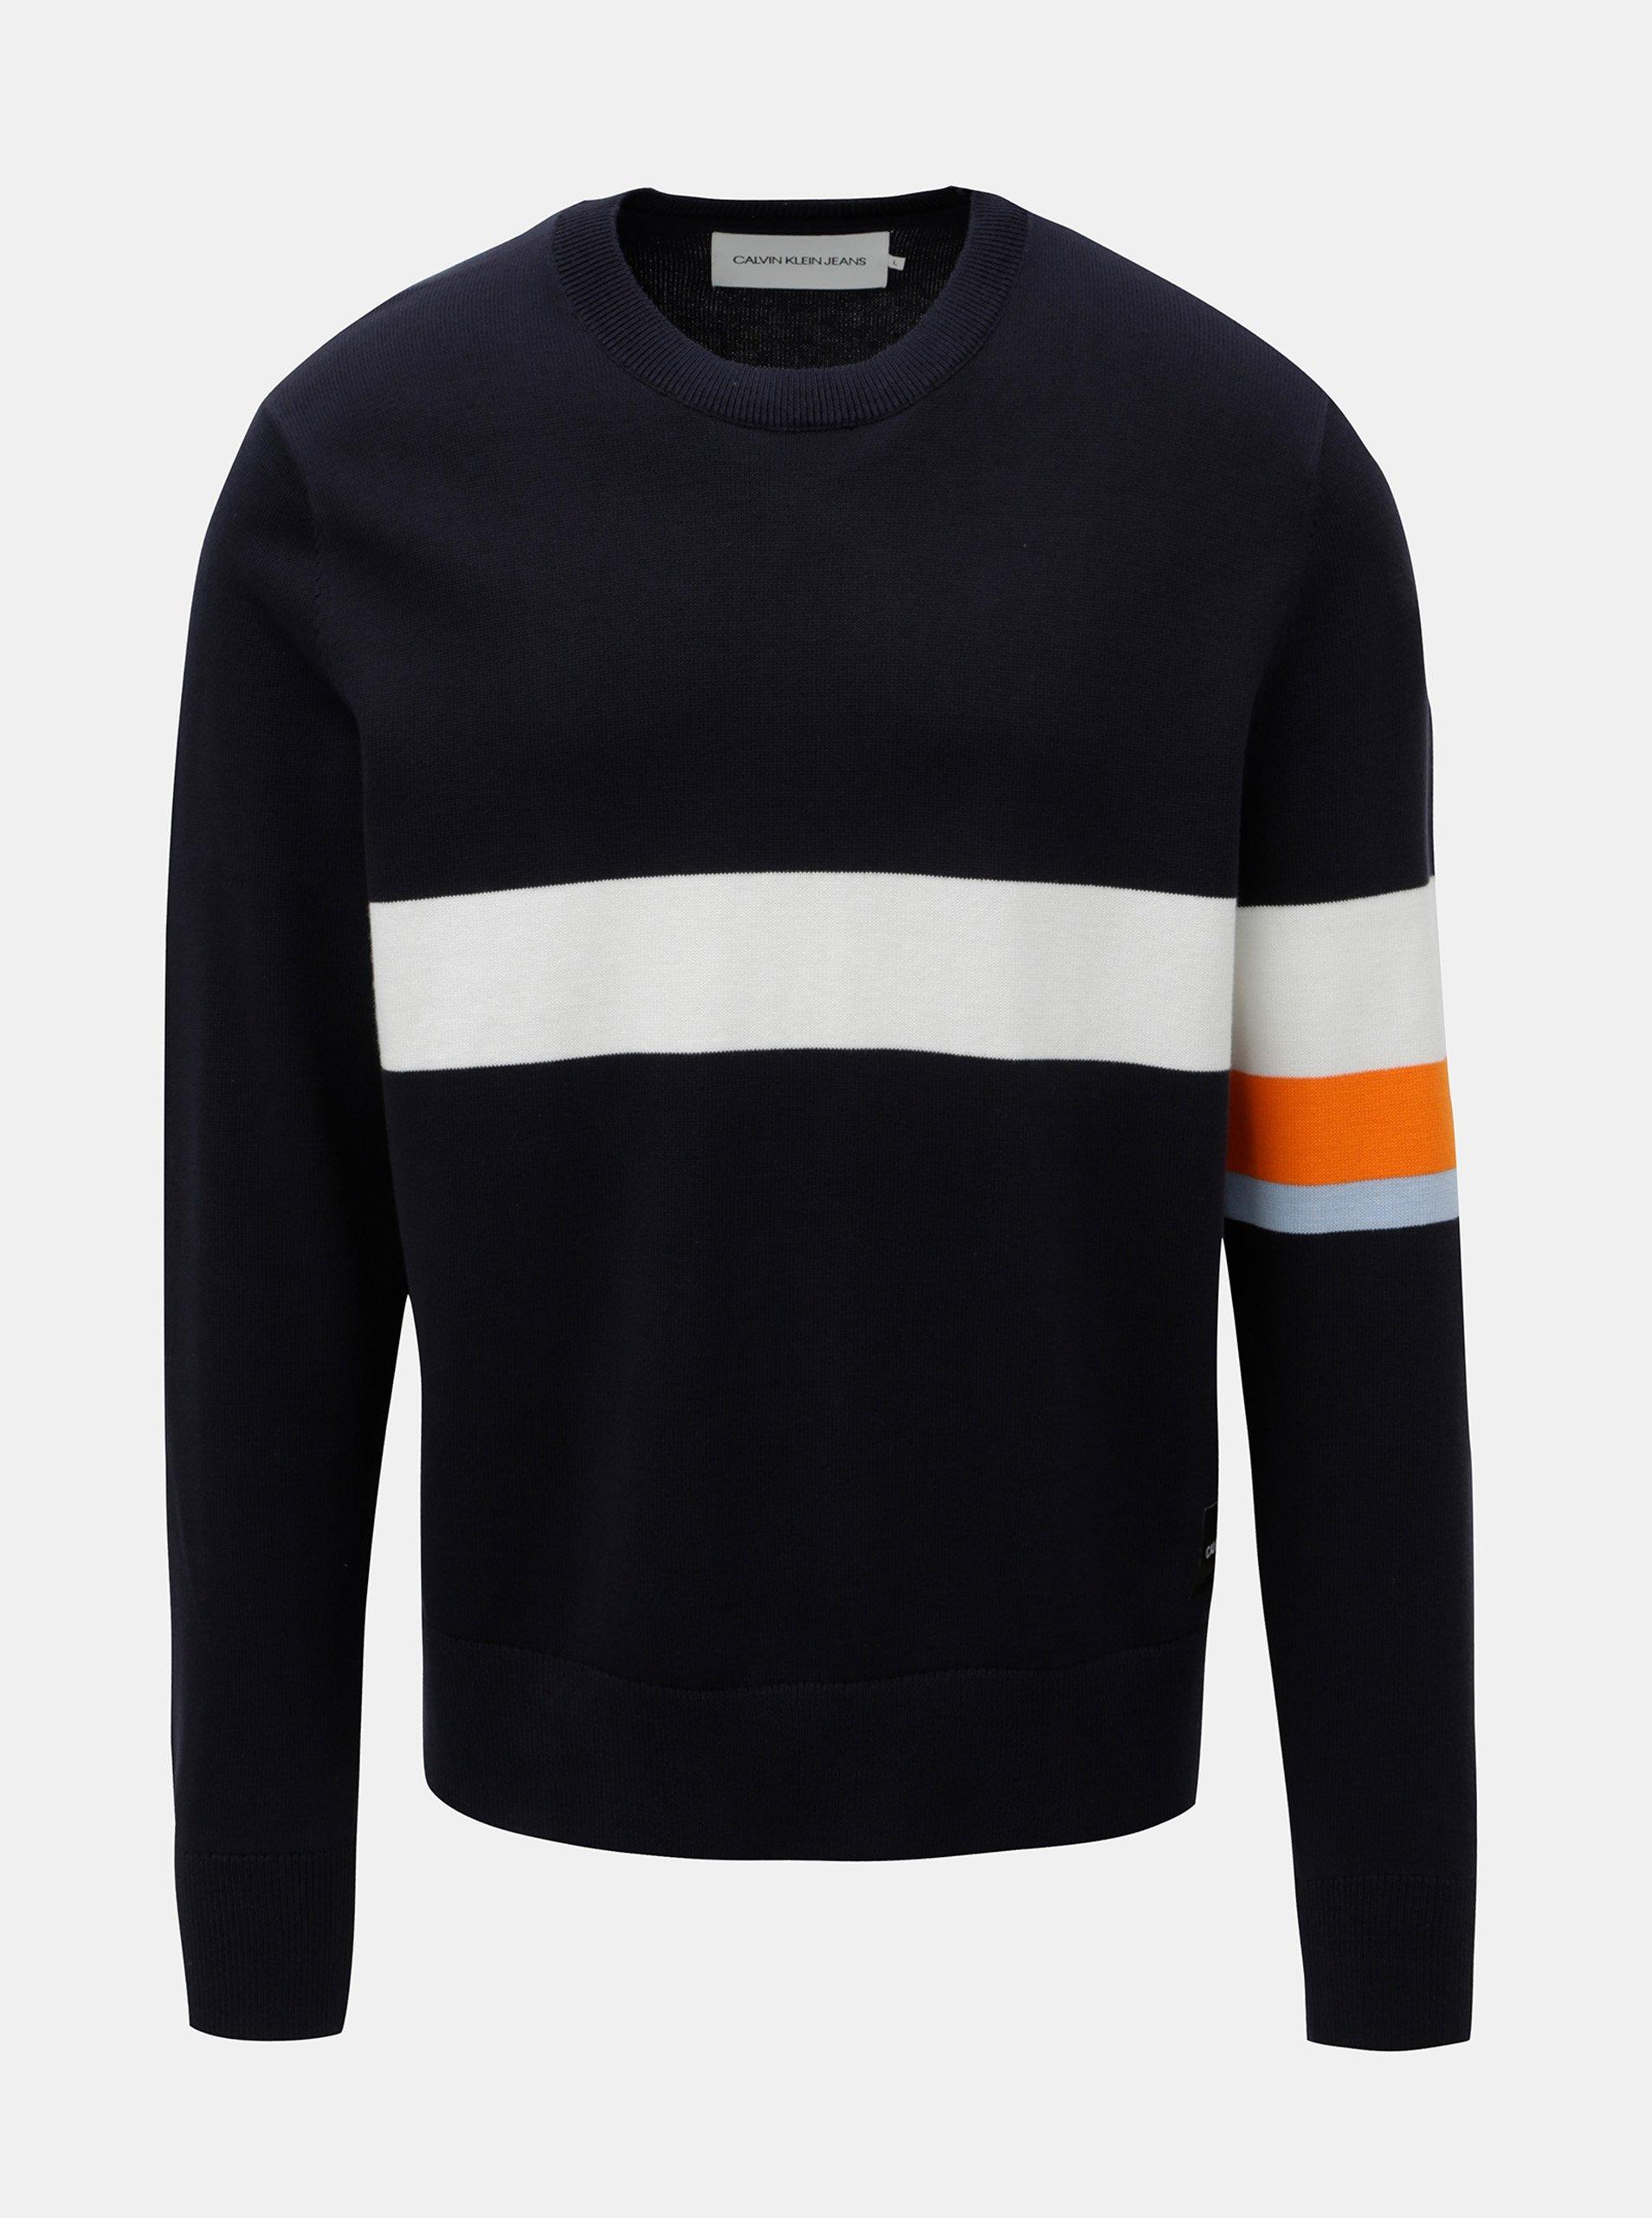 6e2ad0aa79 Tmavomodrý pánsky sveter s pruhmi Calvin Klein Jeans